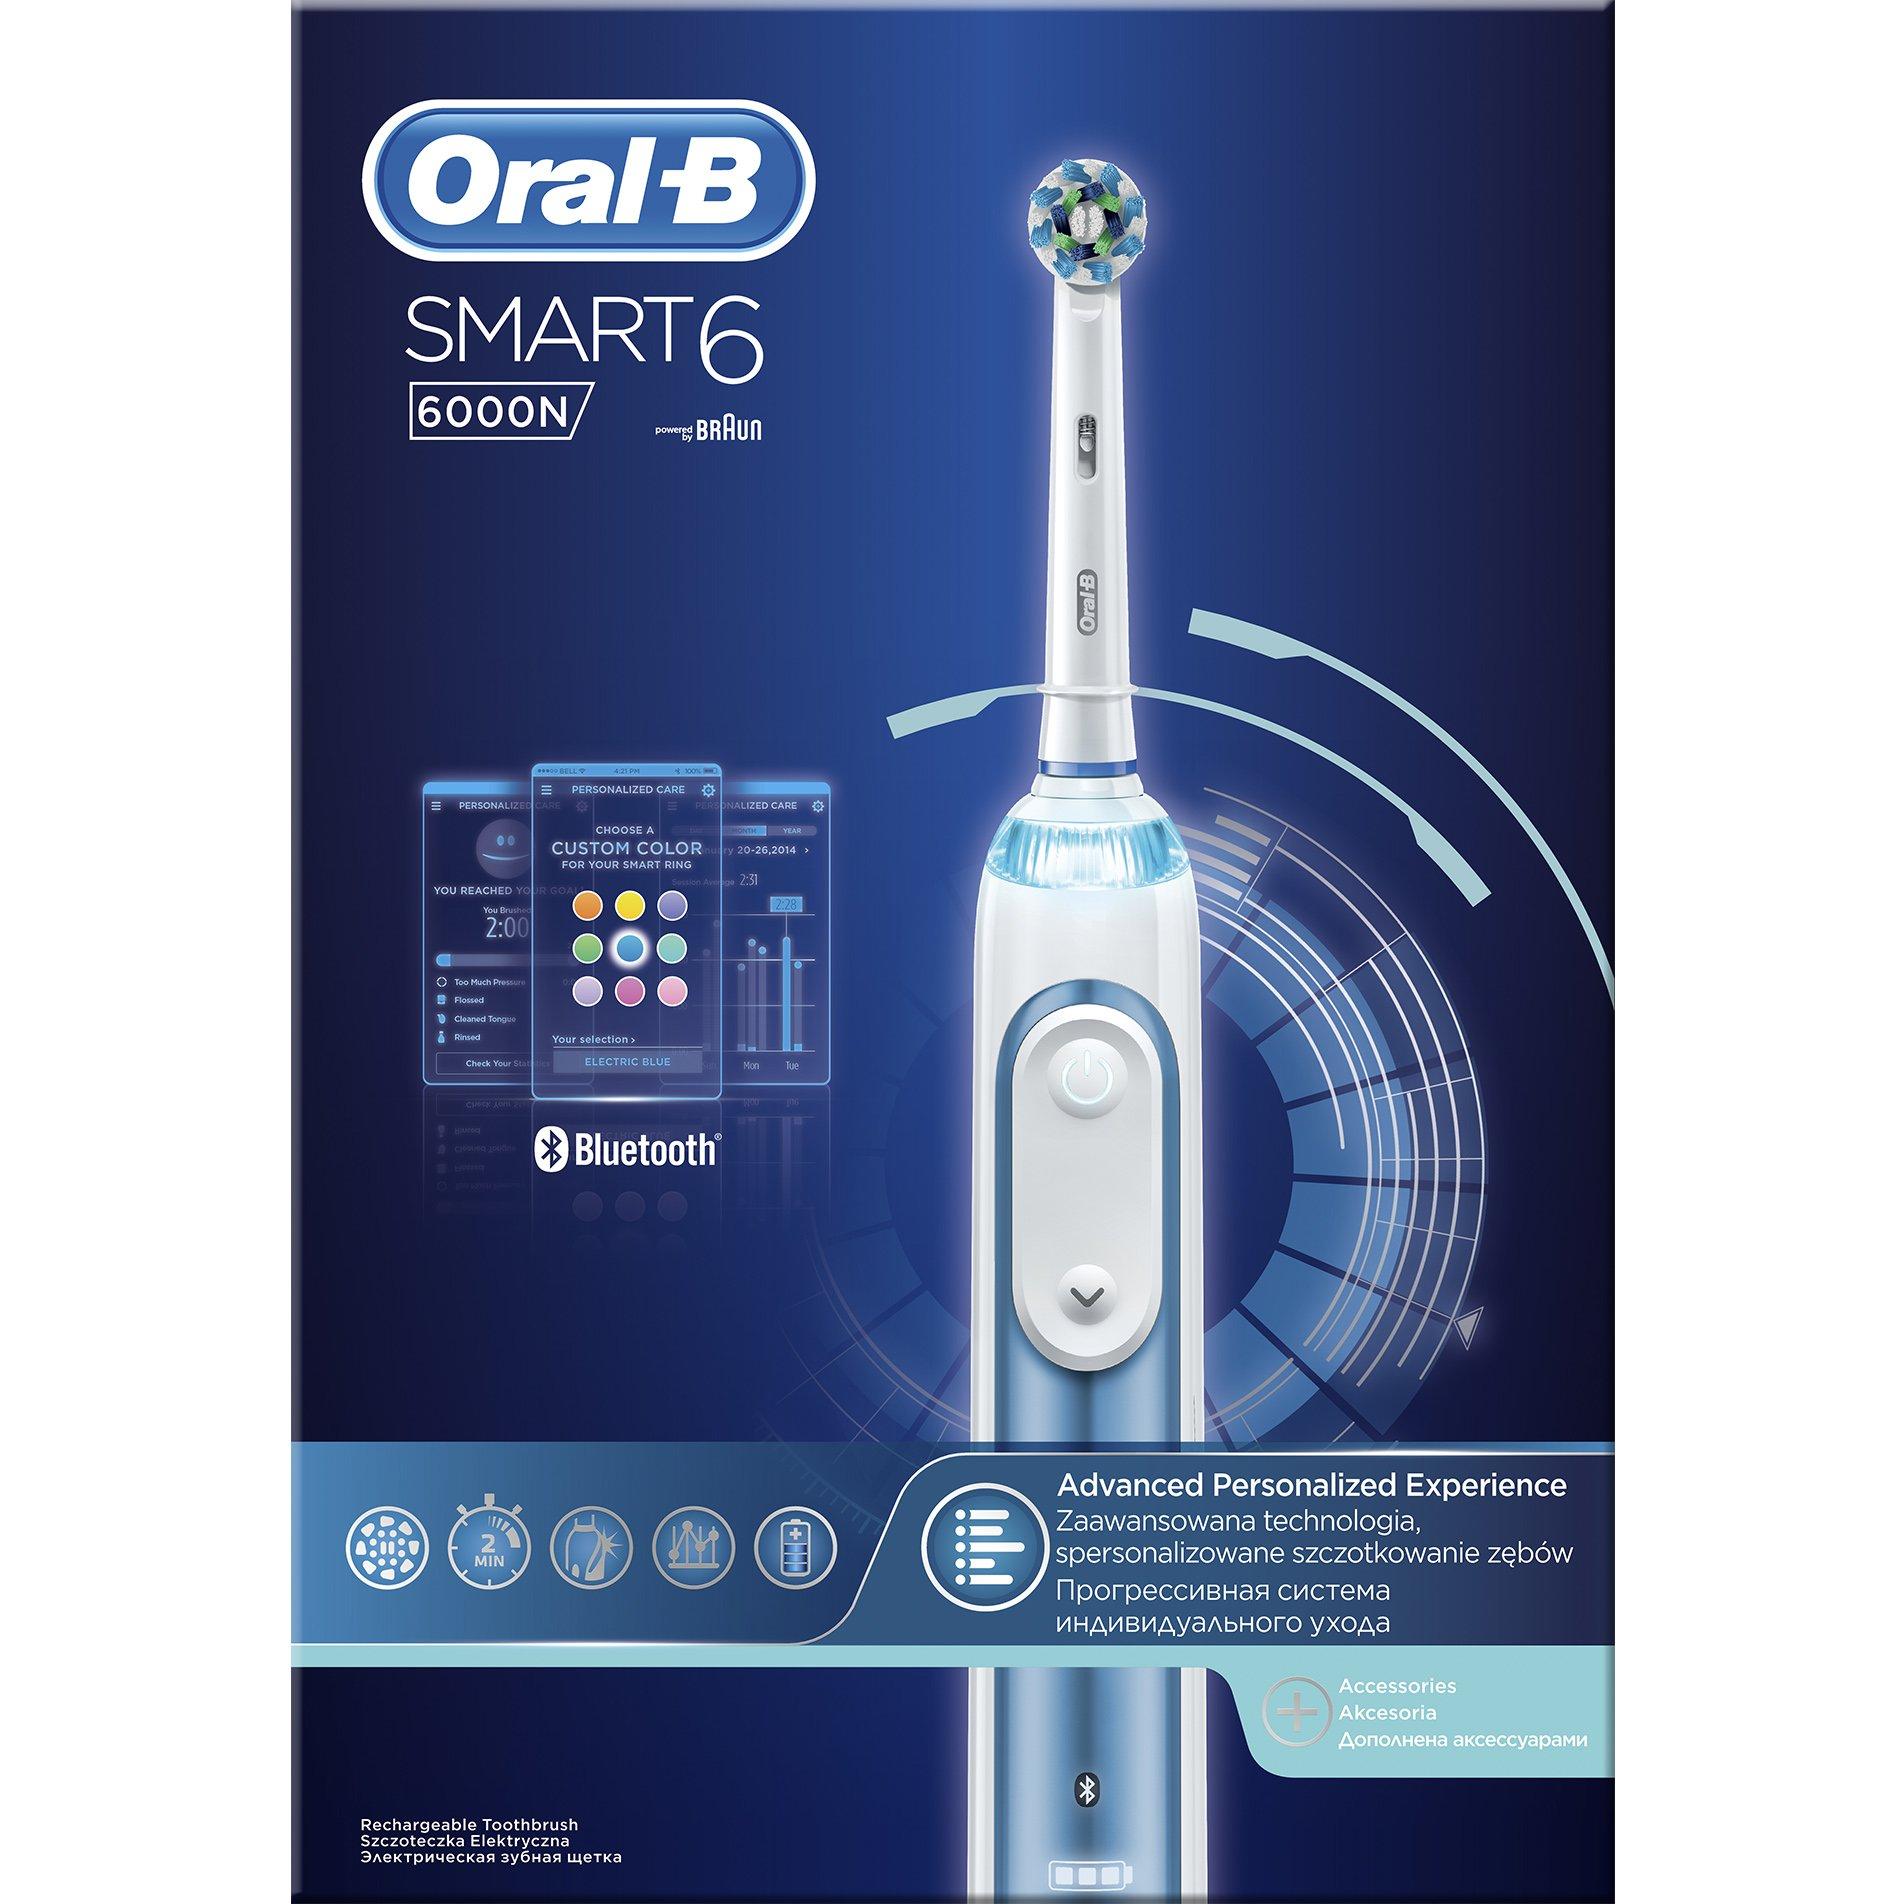 Smart 6 6000 N Ηλεκτρική Οδοντόβουρτσα – Oral-B,Προηγμένες Λειτουργίες & Λειτουργία Bluetooth για Σύνδεση με το Smartphone